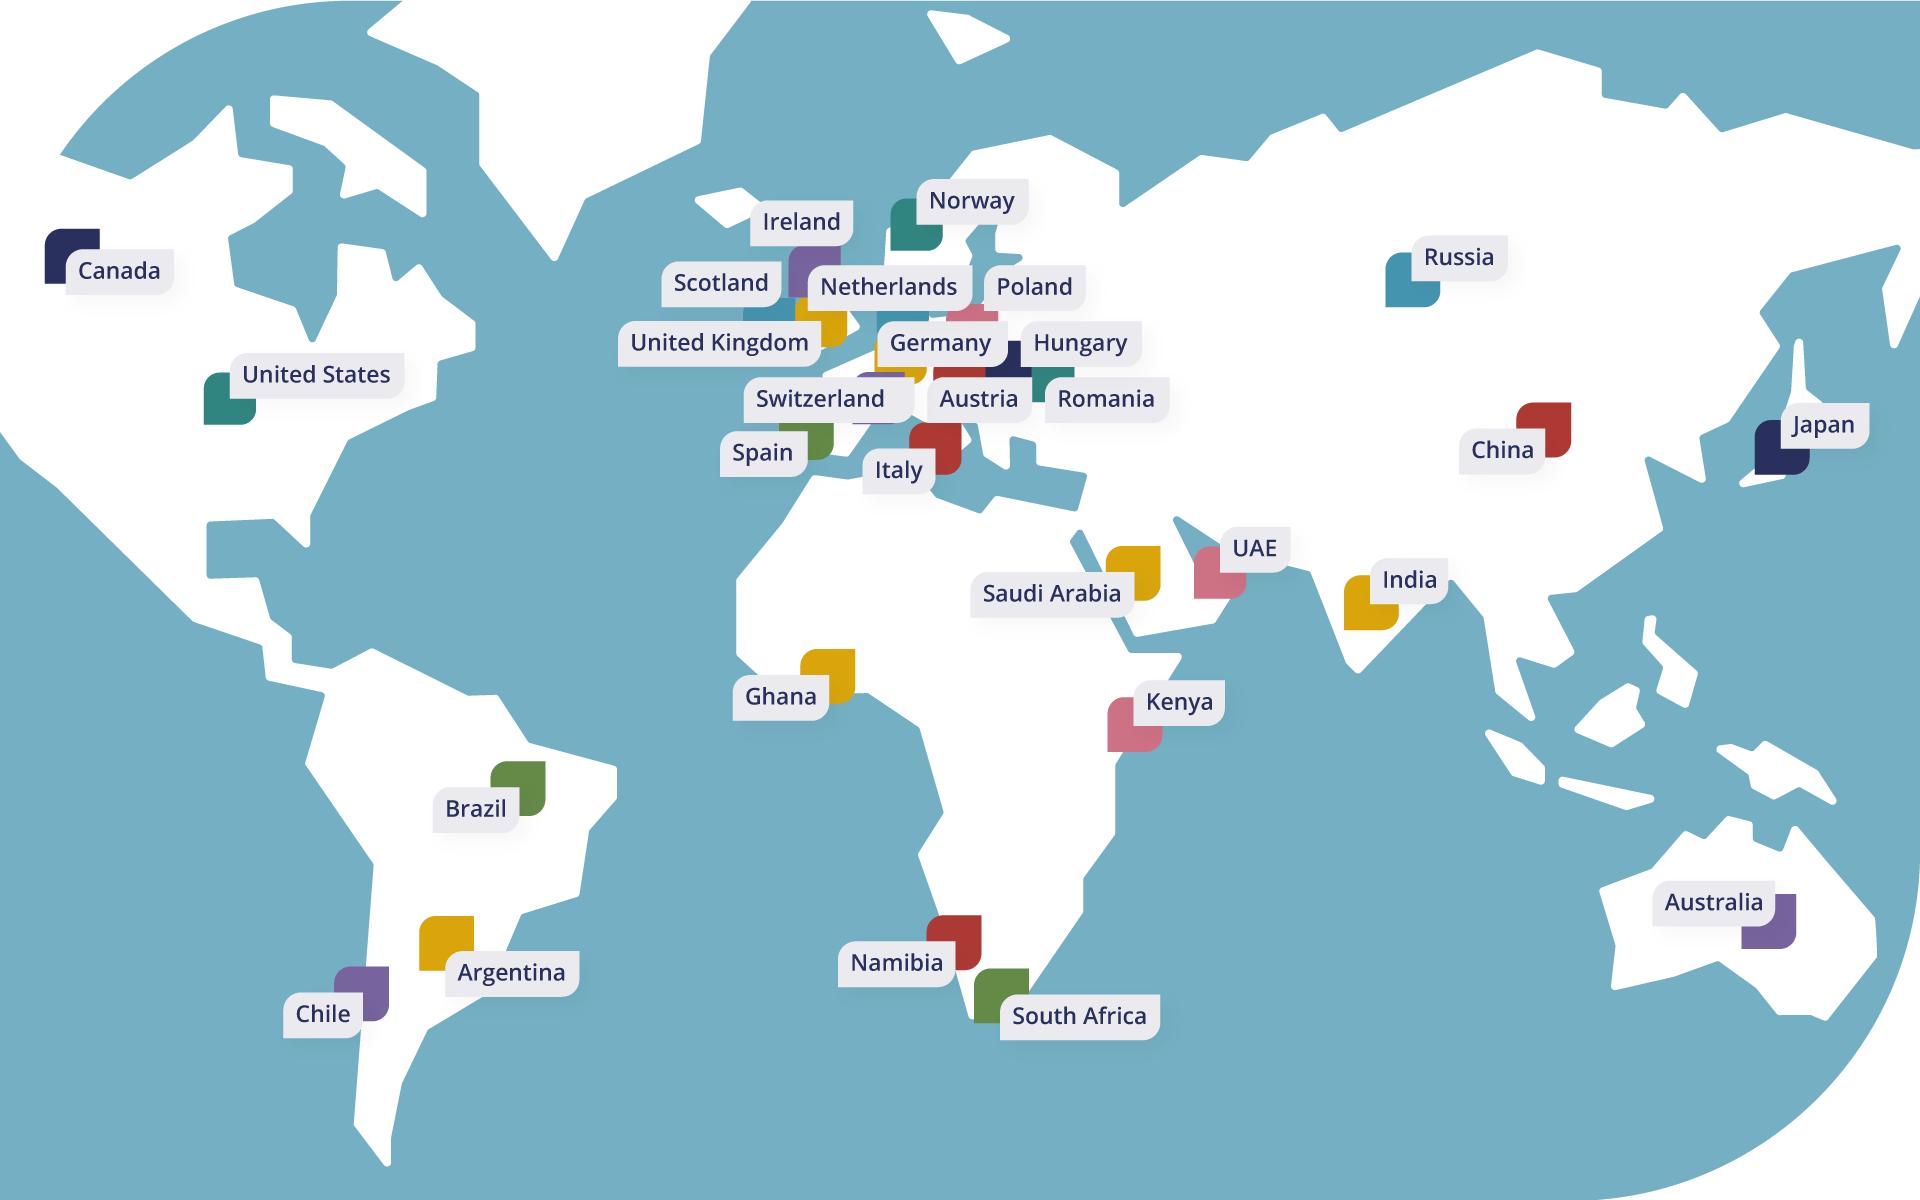 NZ_LinkedIn_Coach-Map_v2